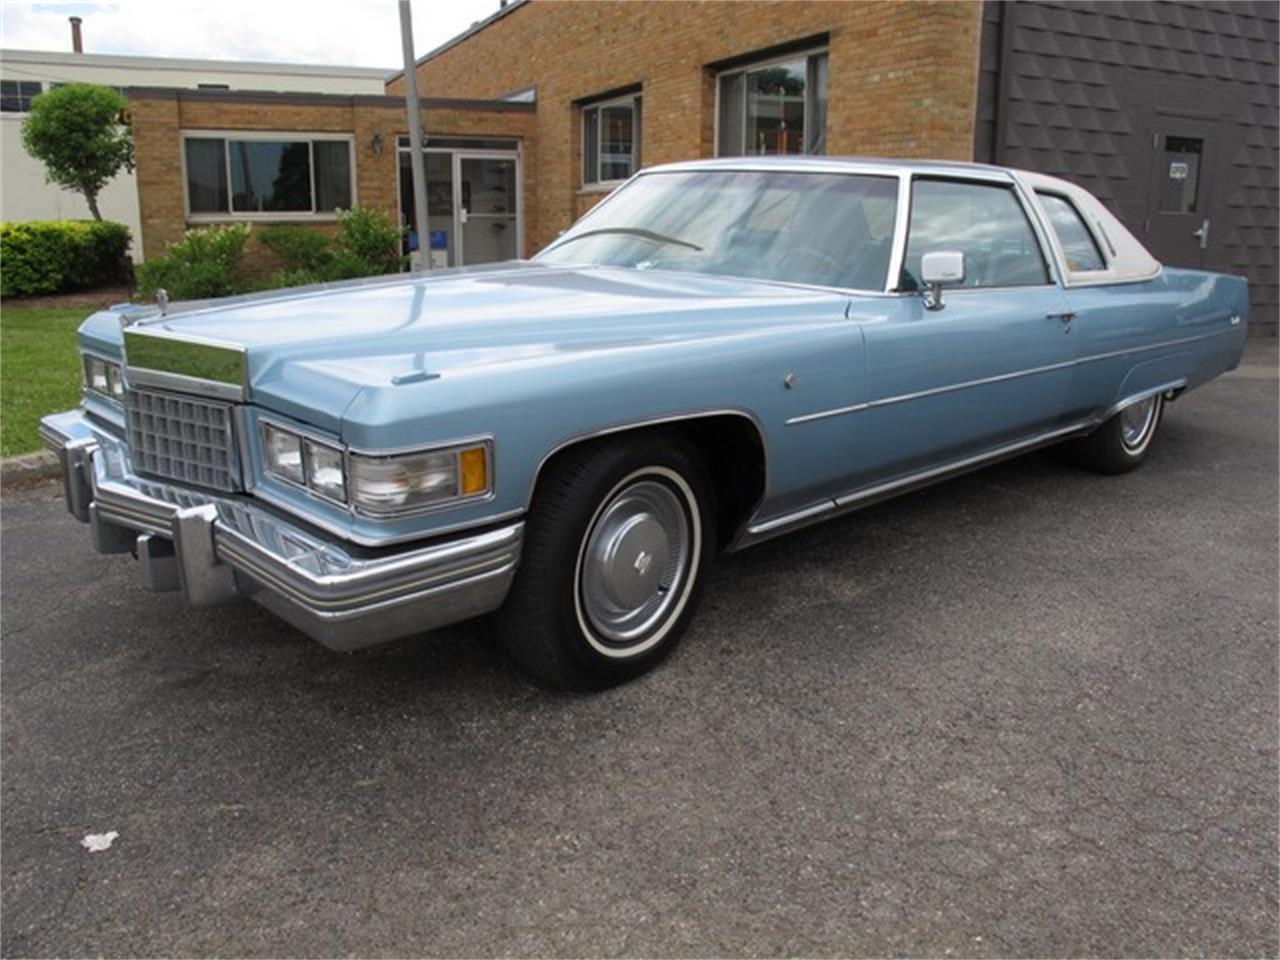 1976 Cadillac Coupe Deville For Sale Classiccars Com